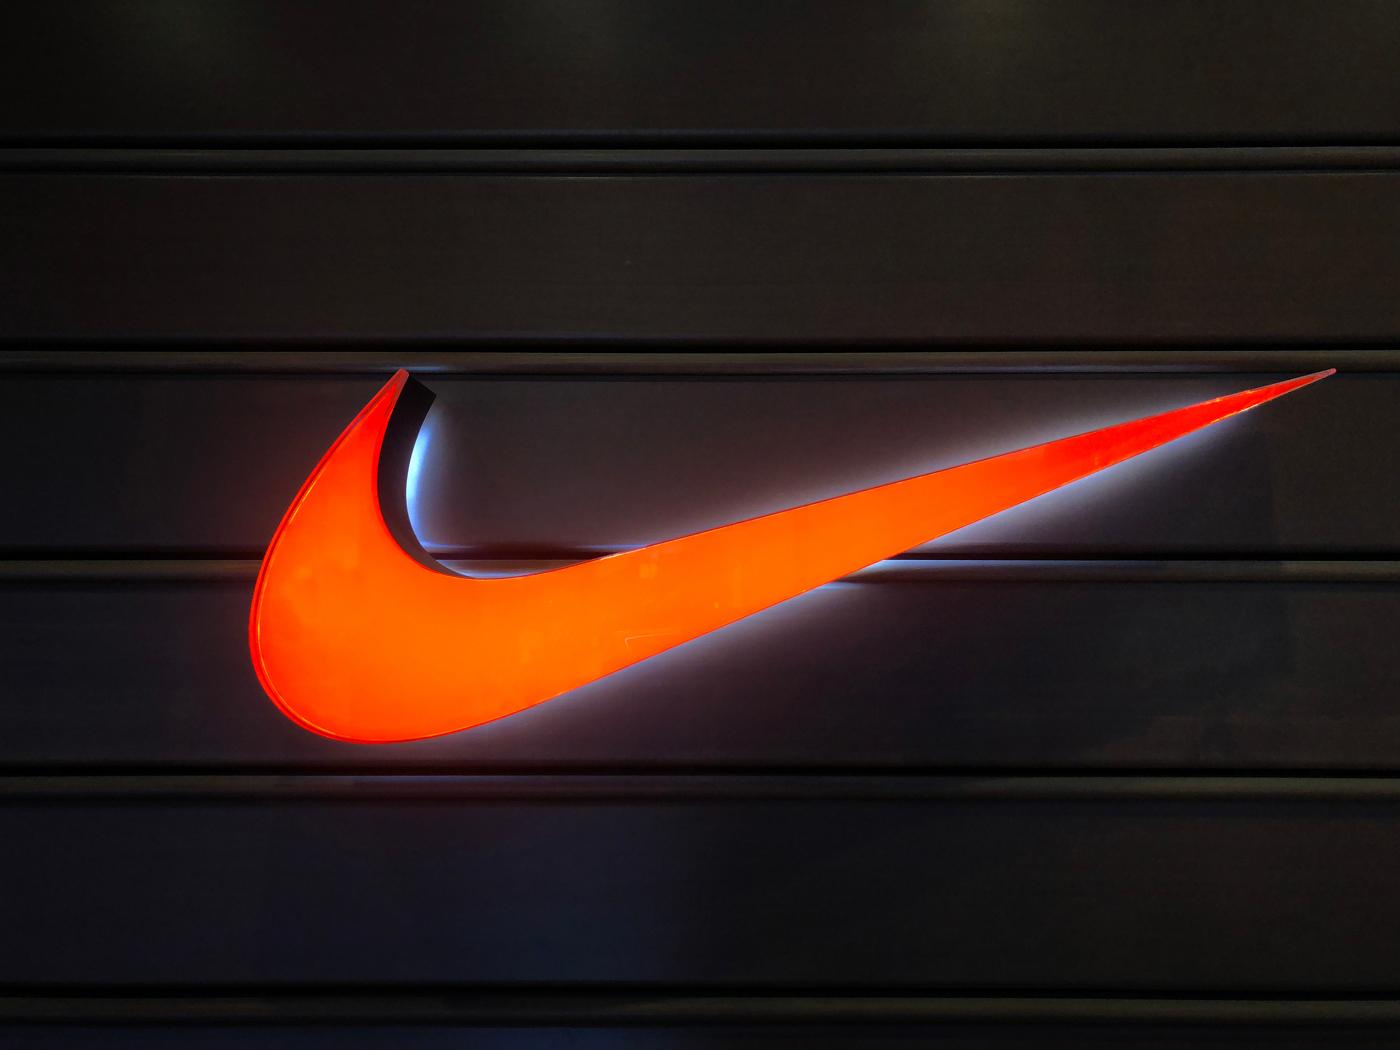 Nike NKE stock market news and analysis